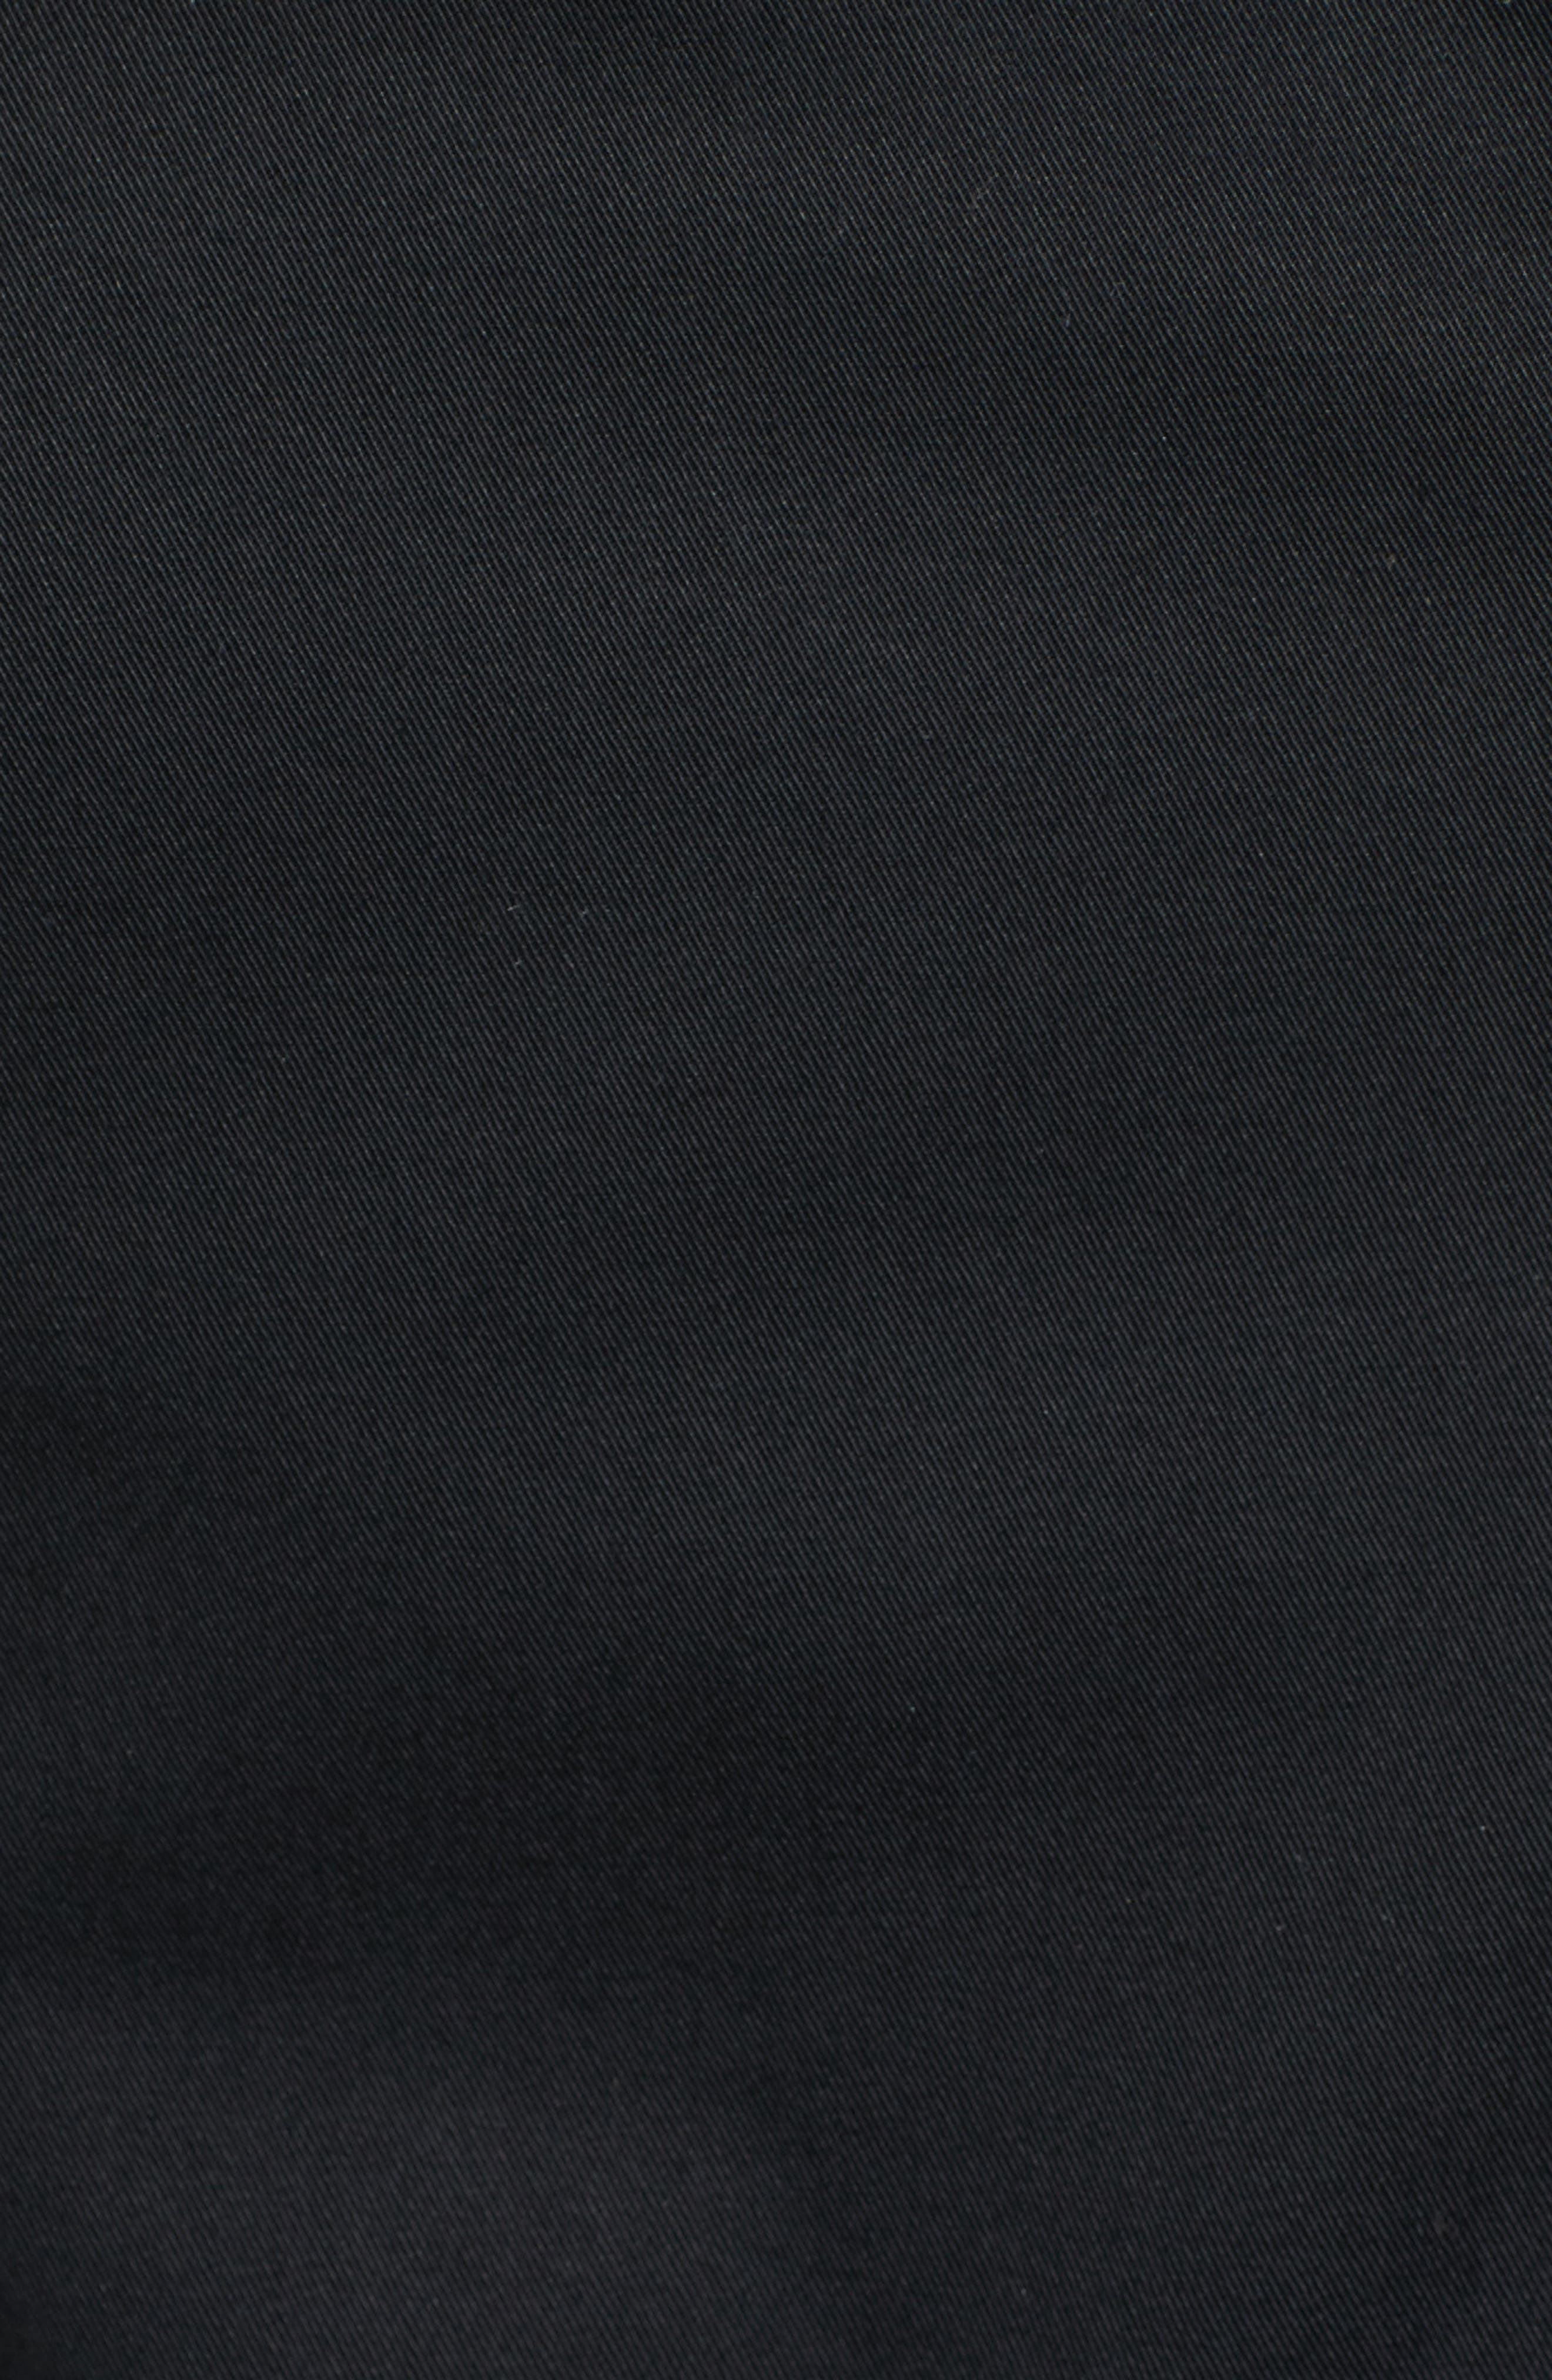 MACKAGE, Estela Belted Long Trench Coat, Alternate thumbnail 5, color, 001